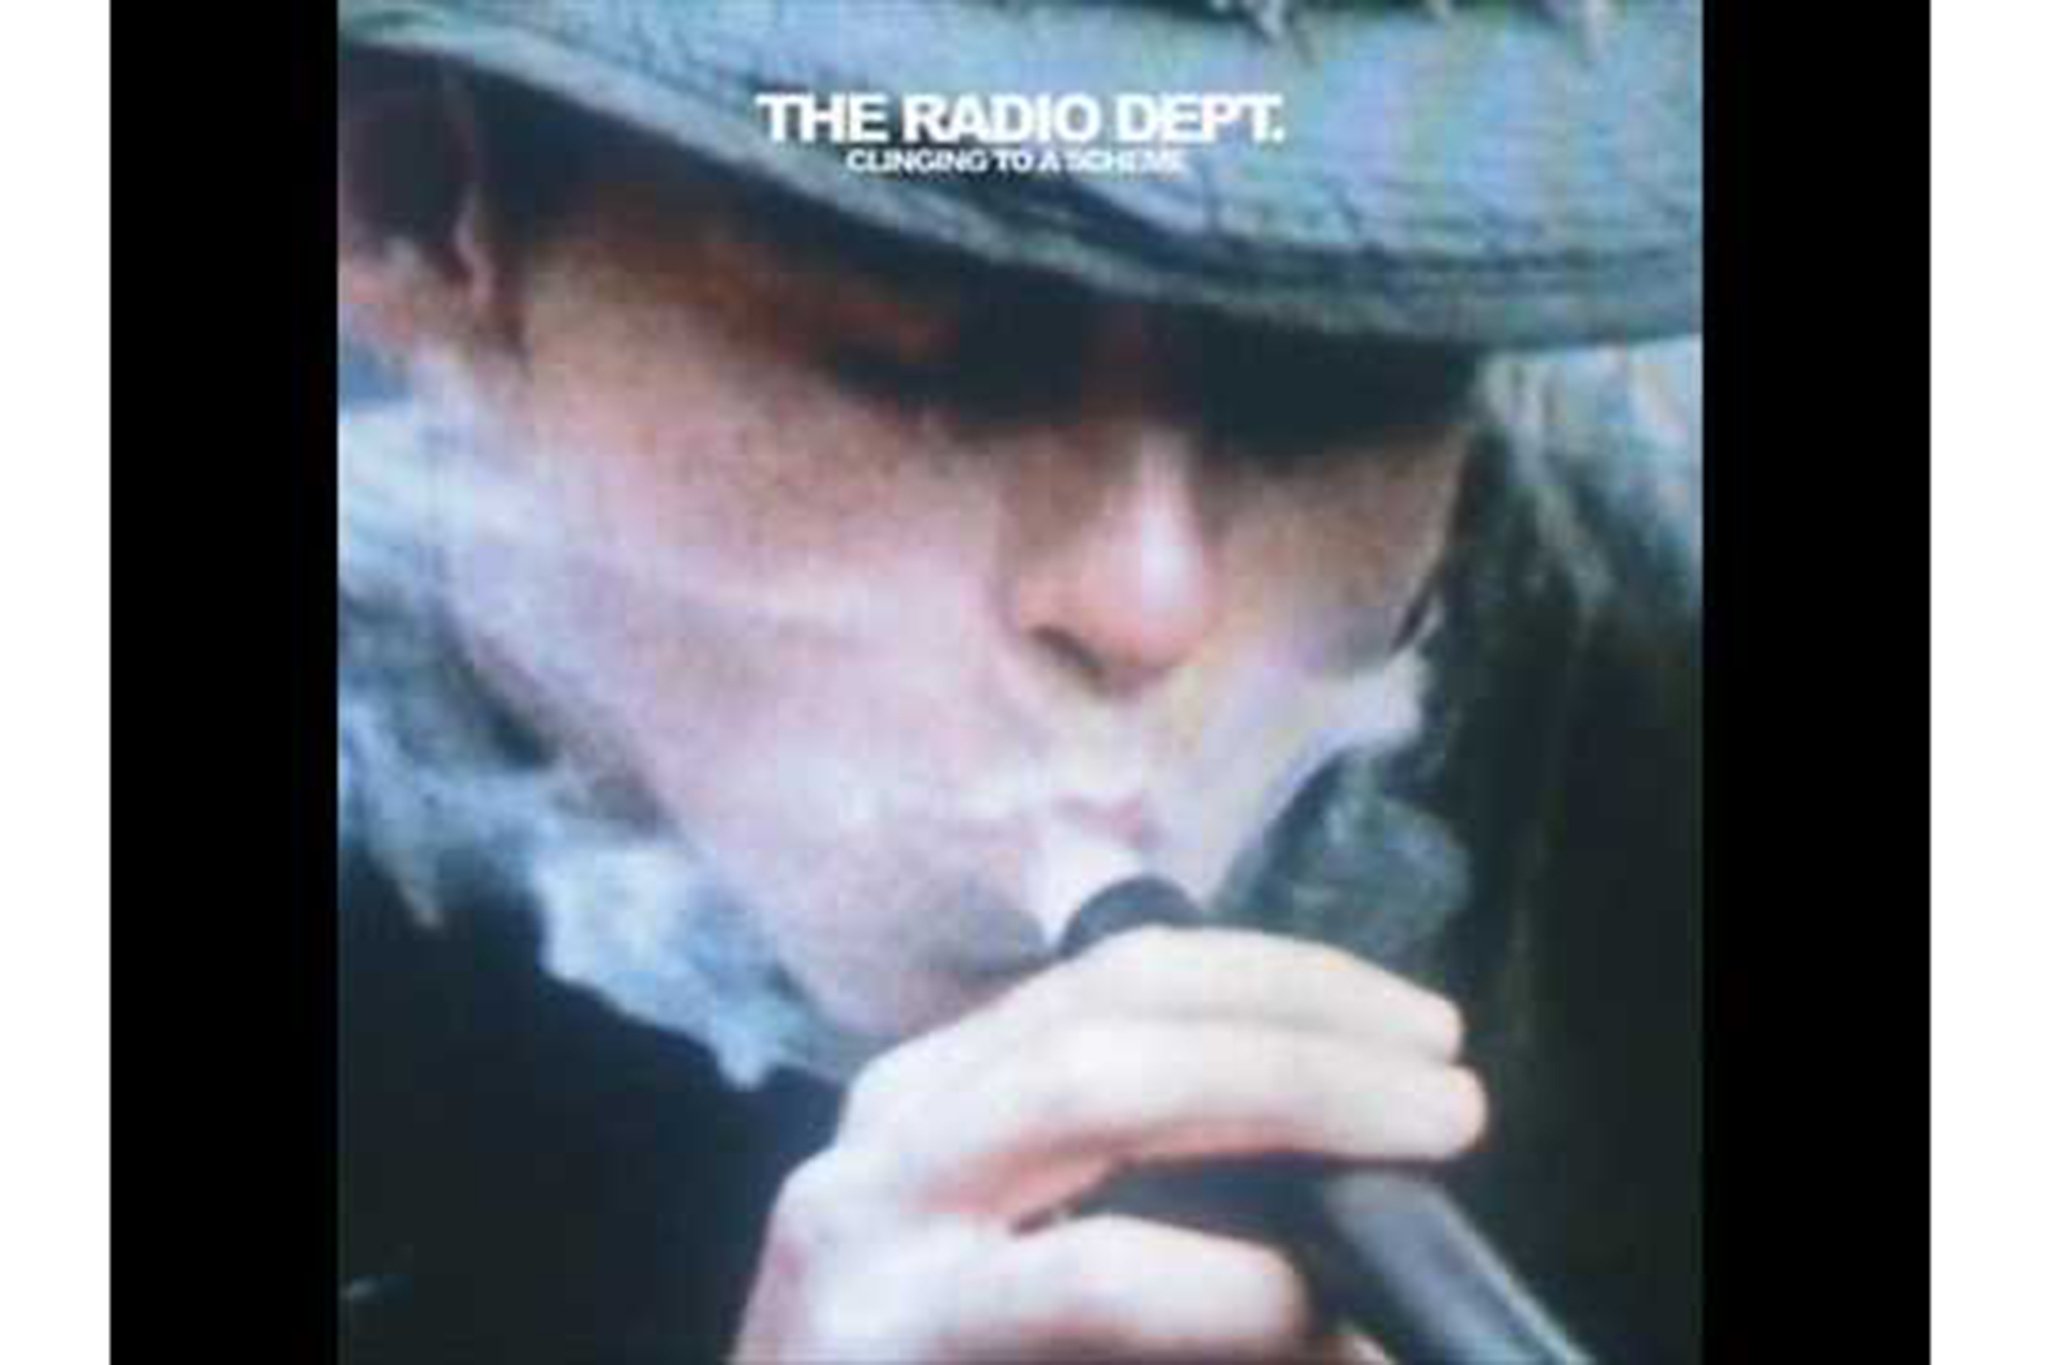 """A Token of Gratitude"" by The Radio Dept"